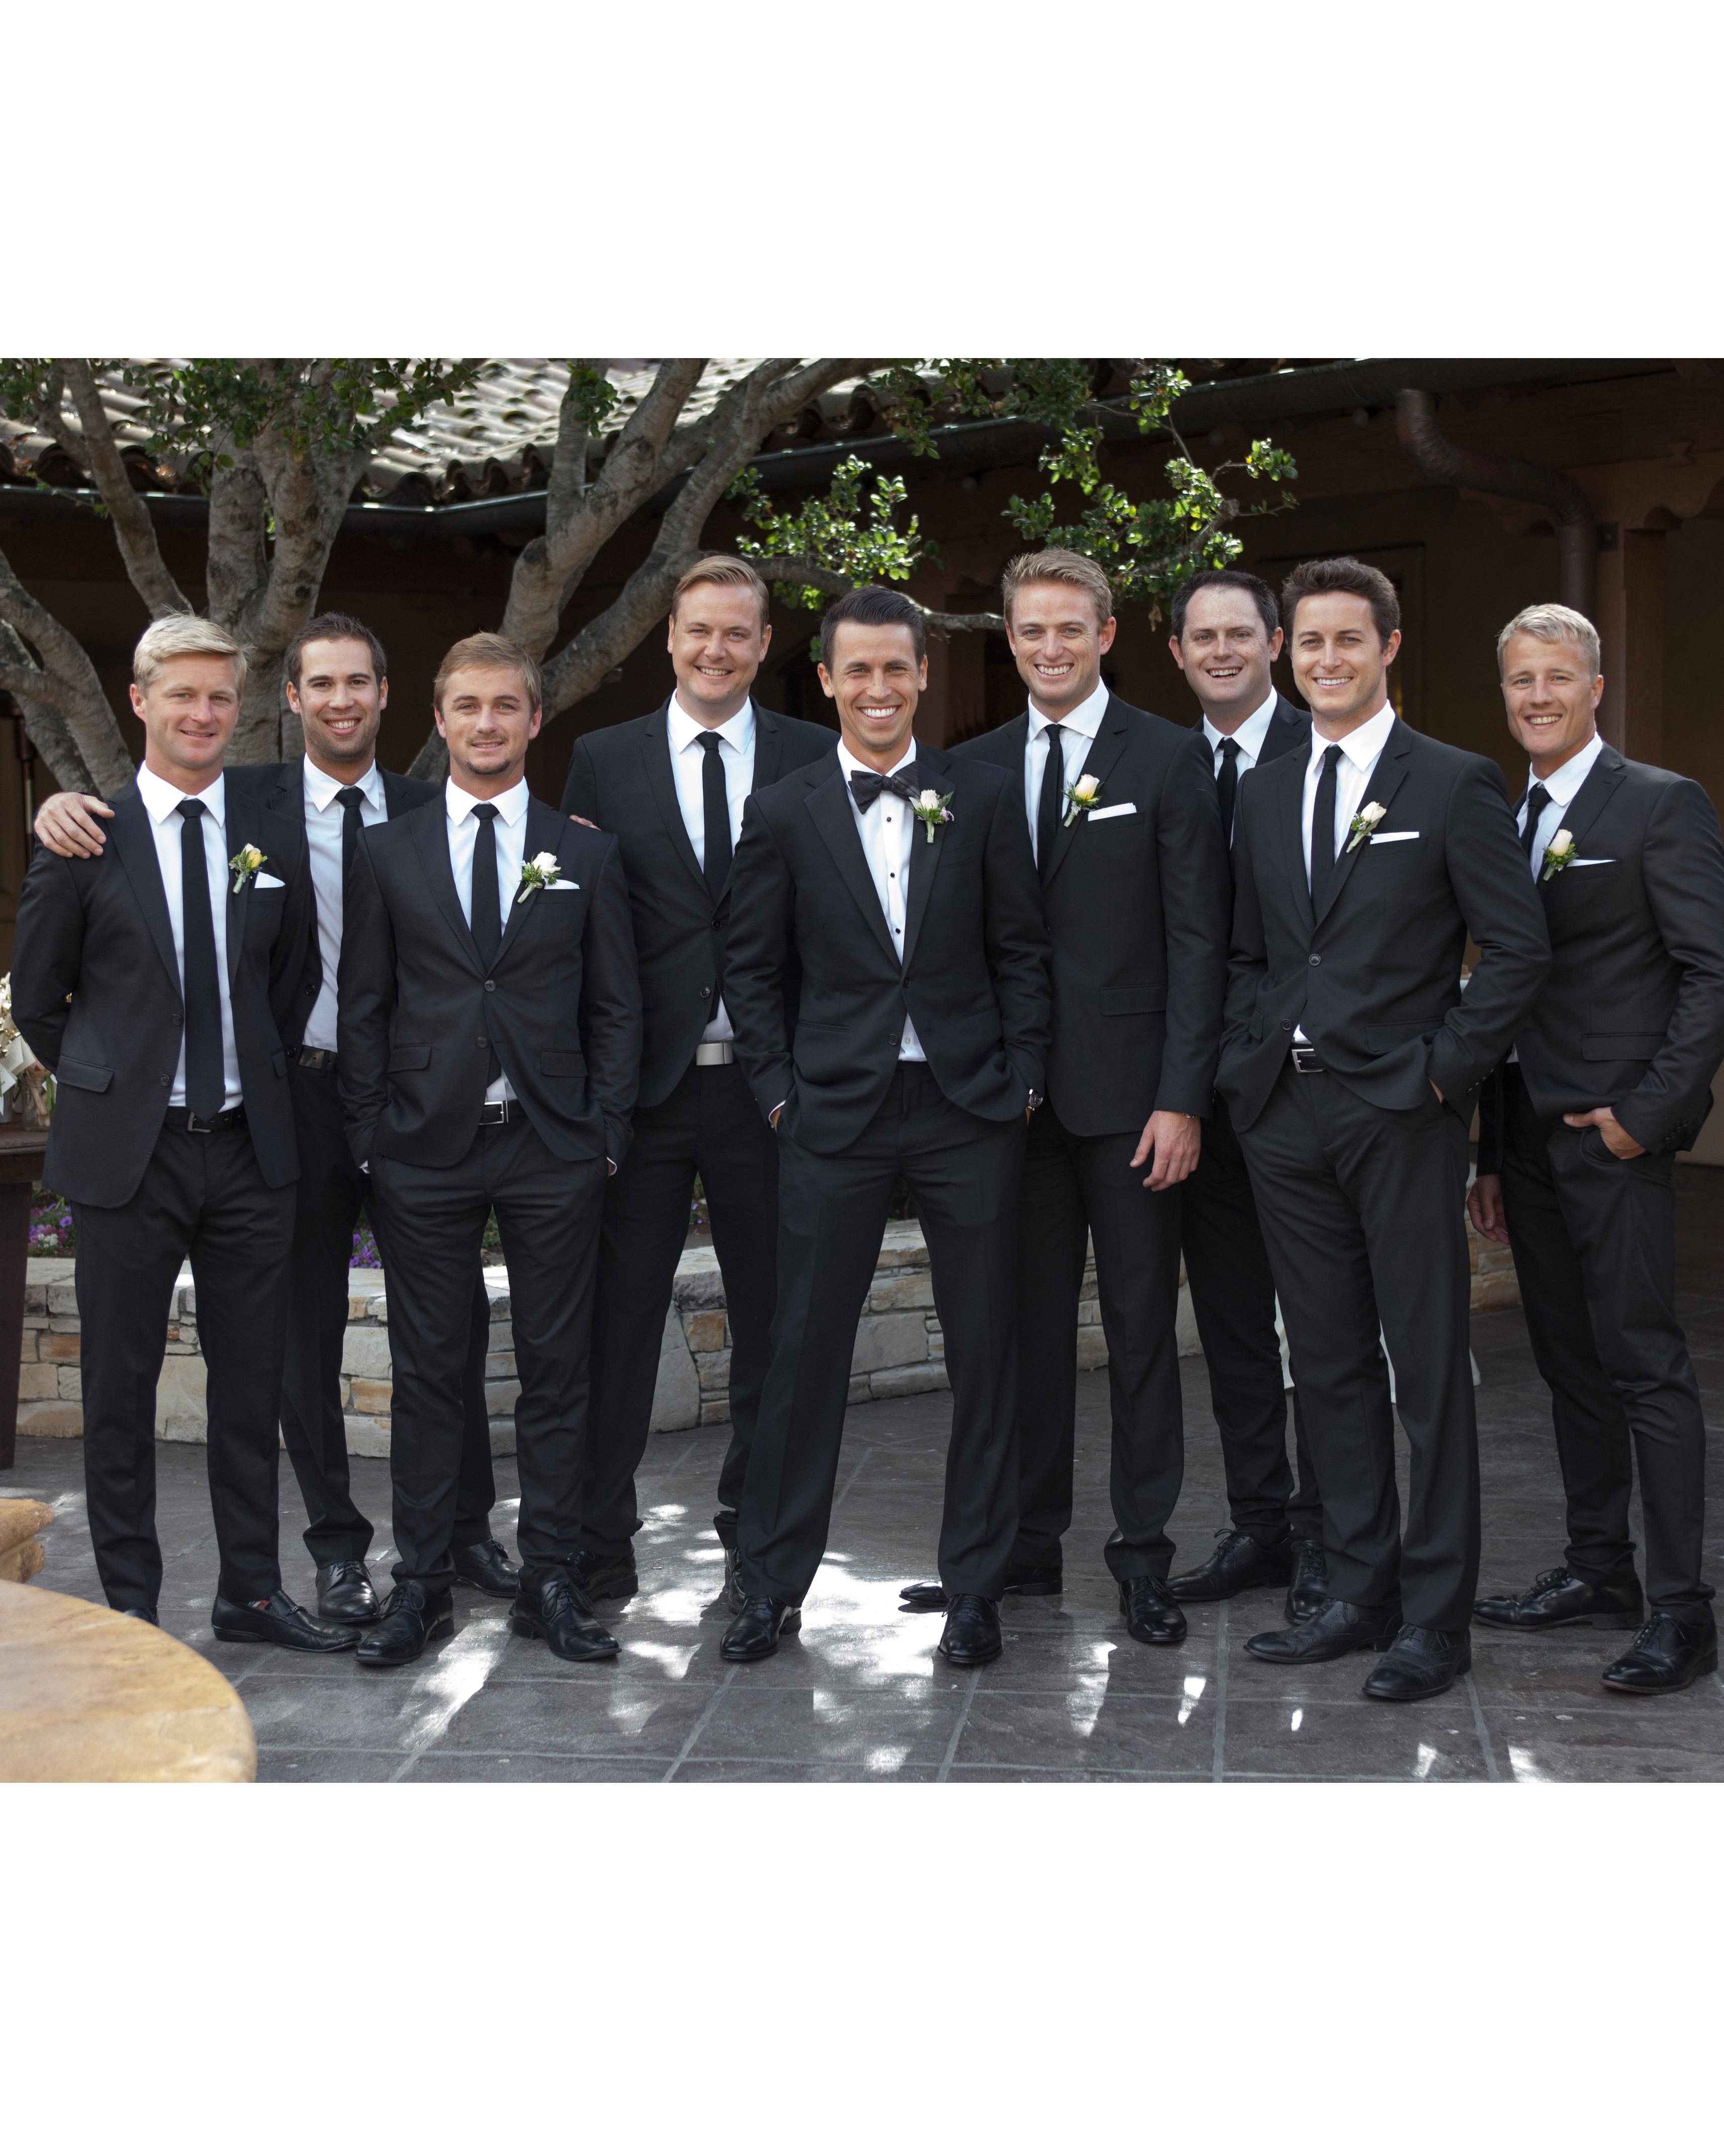 kristin-chris-wedding-groomsmen-244-s112398-0116.jpg